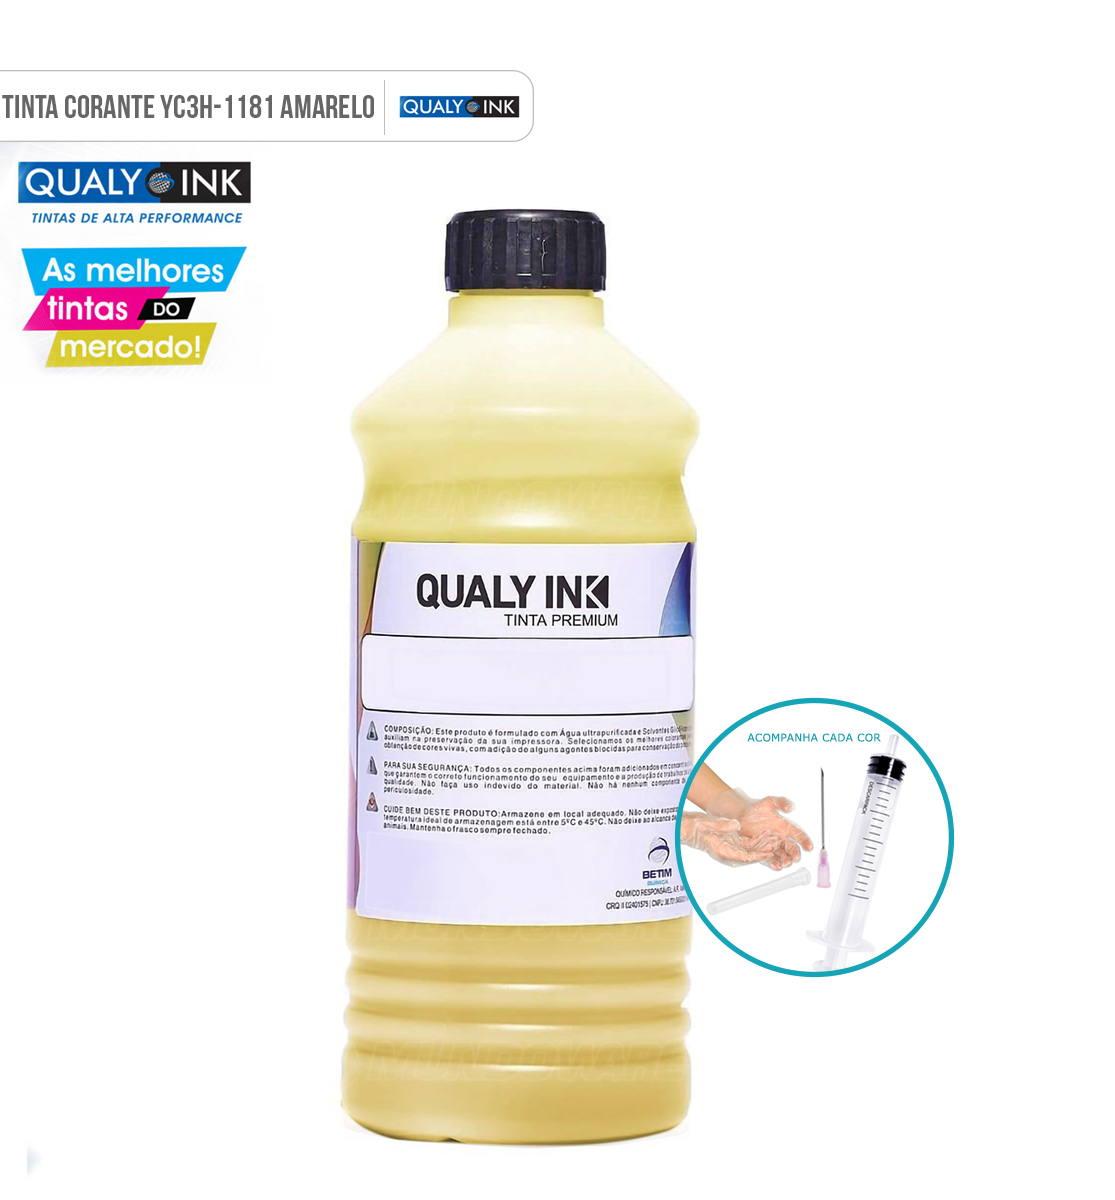 Tinta Yellow Corante para impressoras HP Officejet Pro 8610 8615 8620 8625 8630 251dw 276dw 8100 N811a 8600 N911a 8600 Plus N911g 7110 H812a 7610 H912a 6230 6830 8000 A809a 8000 A811a 8000 A809n 8500 A909a 8500 A909g